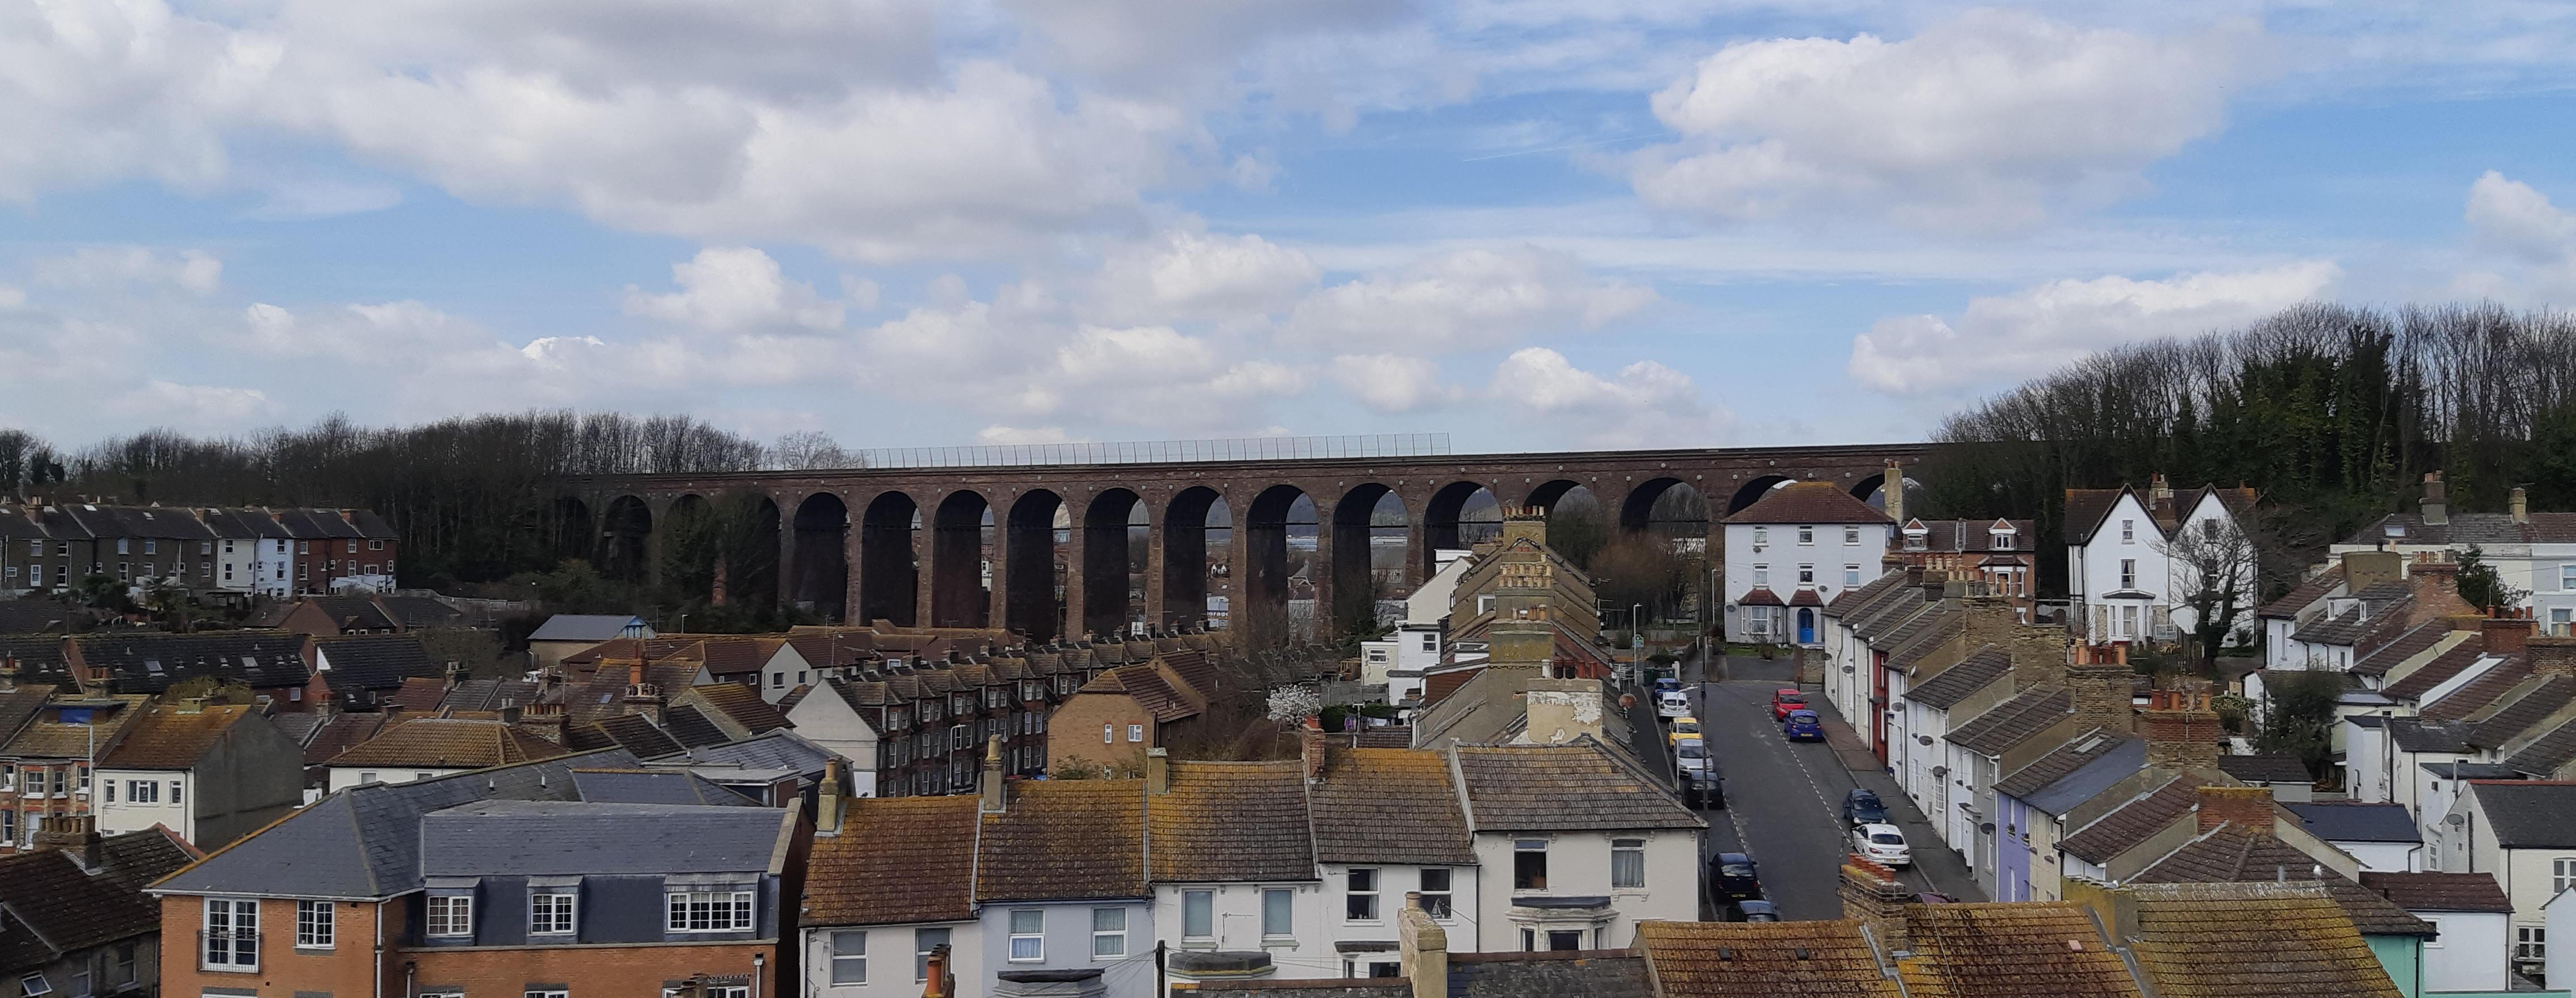 Railway Viaduct Helen Sharp